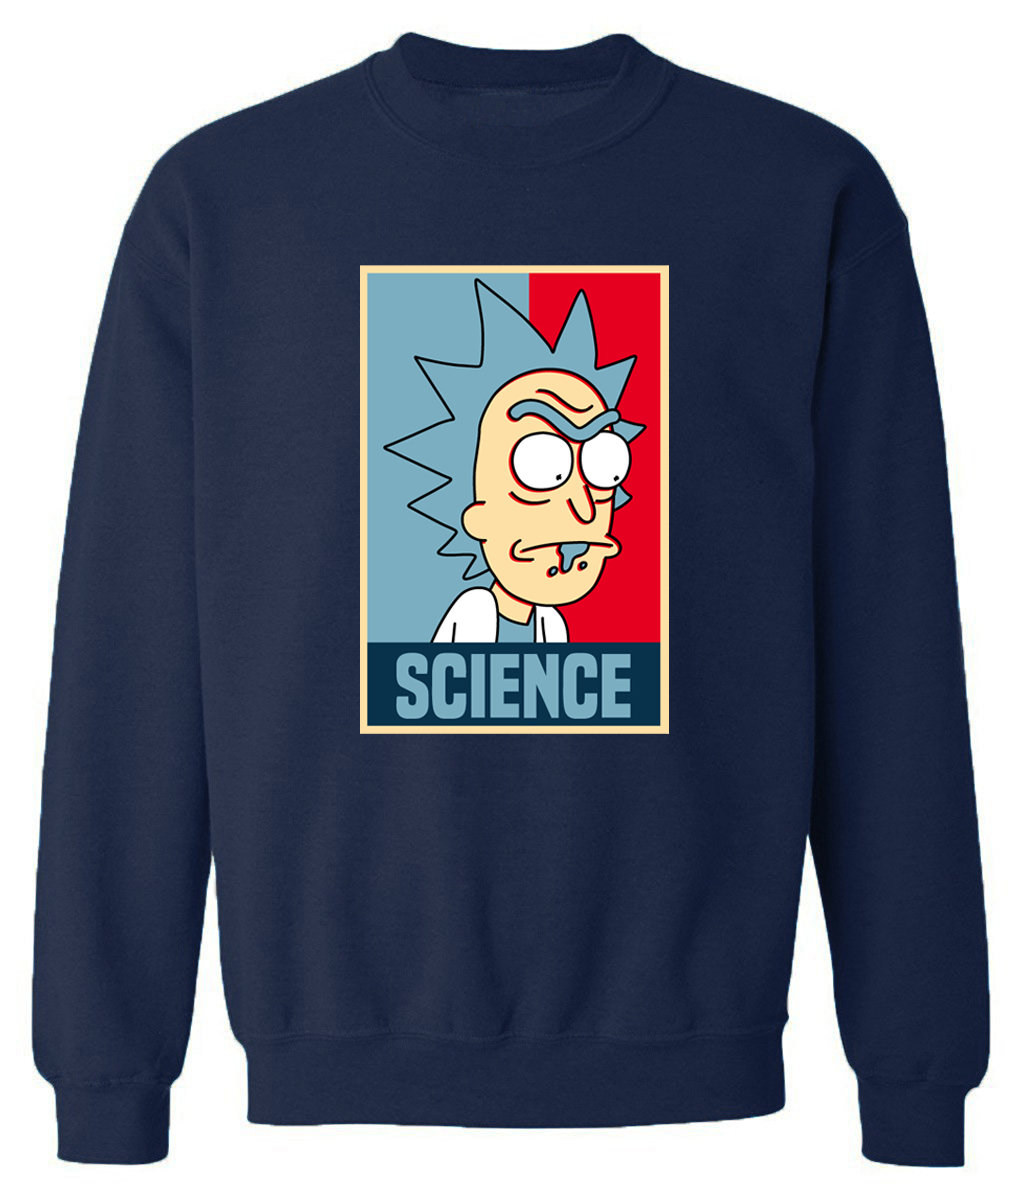 2020 New Hot Rick Science Sweatshirts